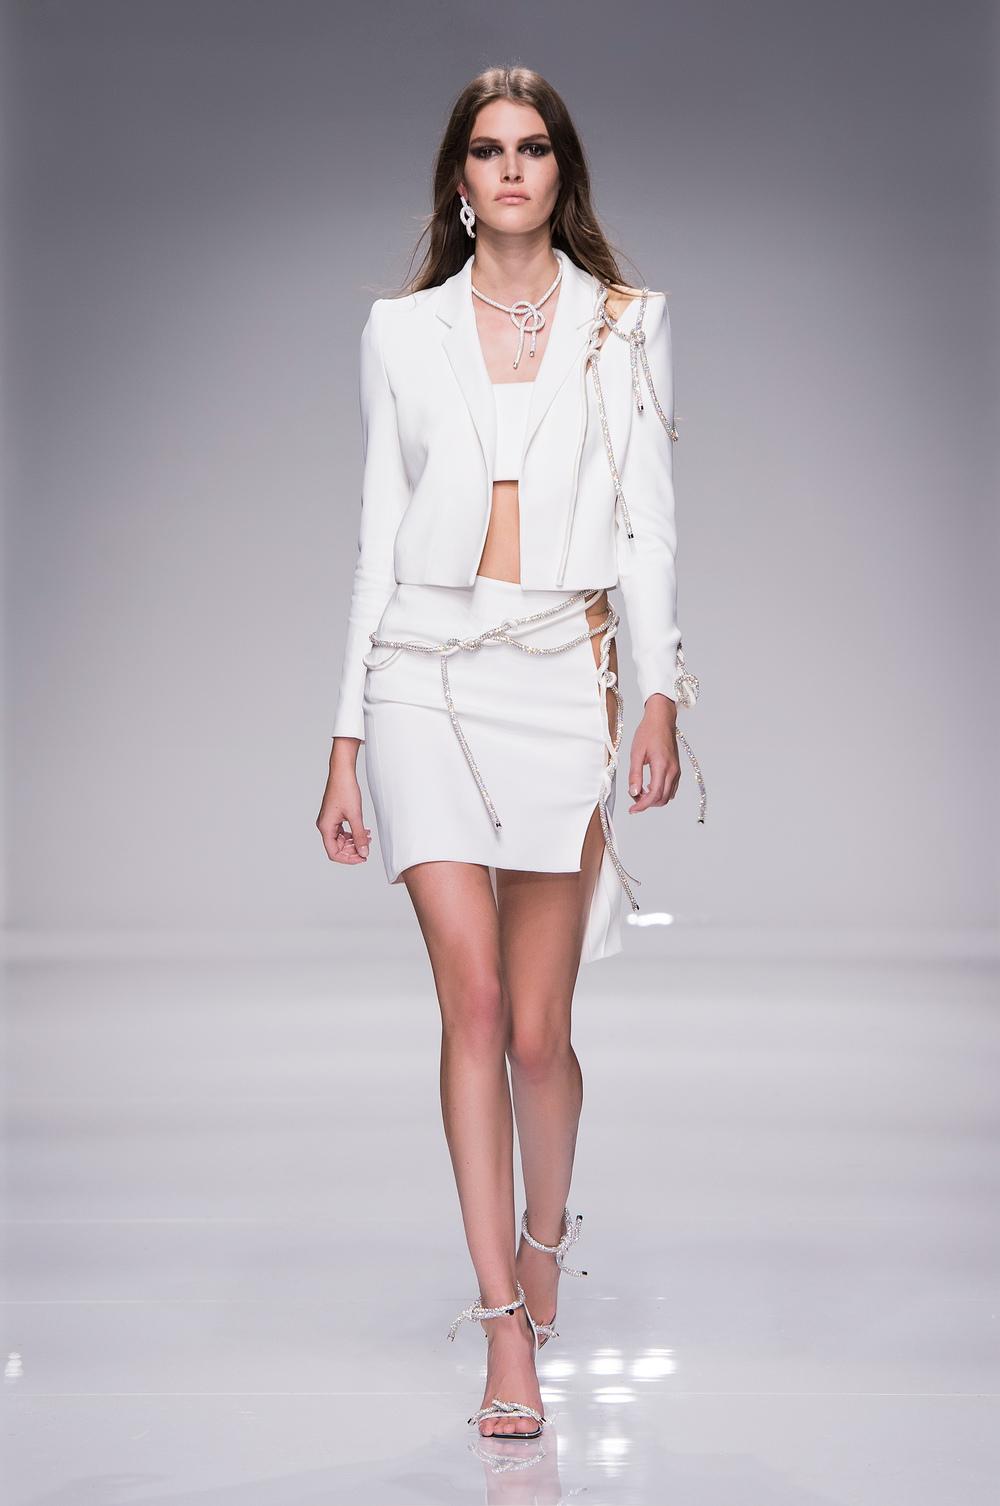 Atelier Versace SS16_Look 40.JPG